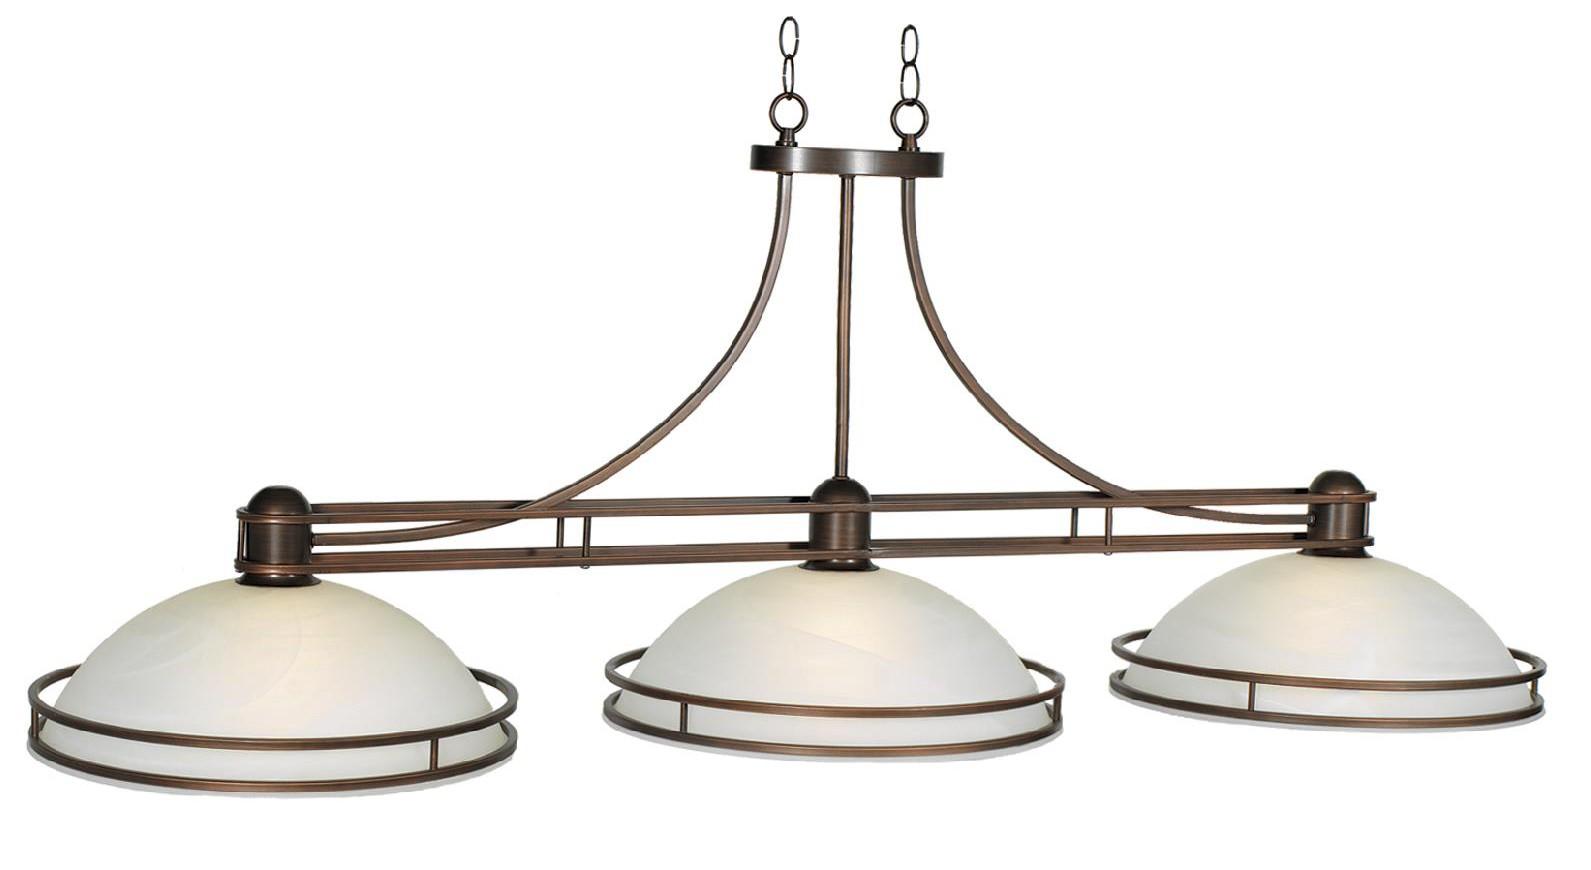 Cosmopolitan 56 3lt billiard light bronze lampes de billard billard et accessoires - Lampe pour table de billard ...